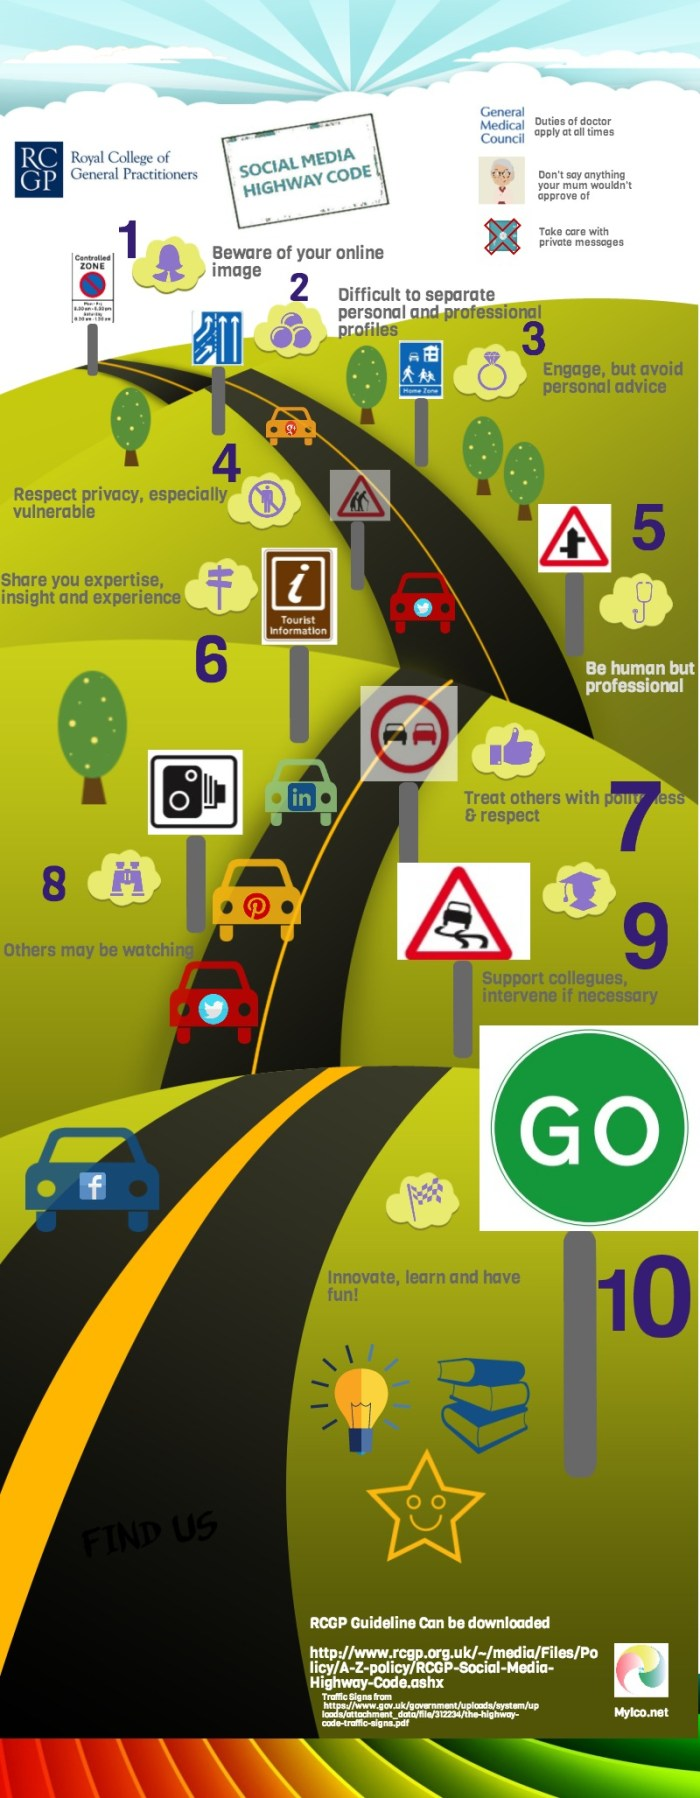 RCGP - Social Media Highway Code